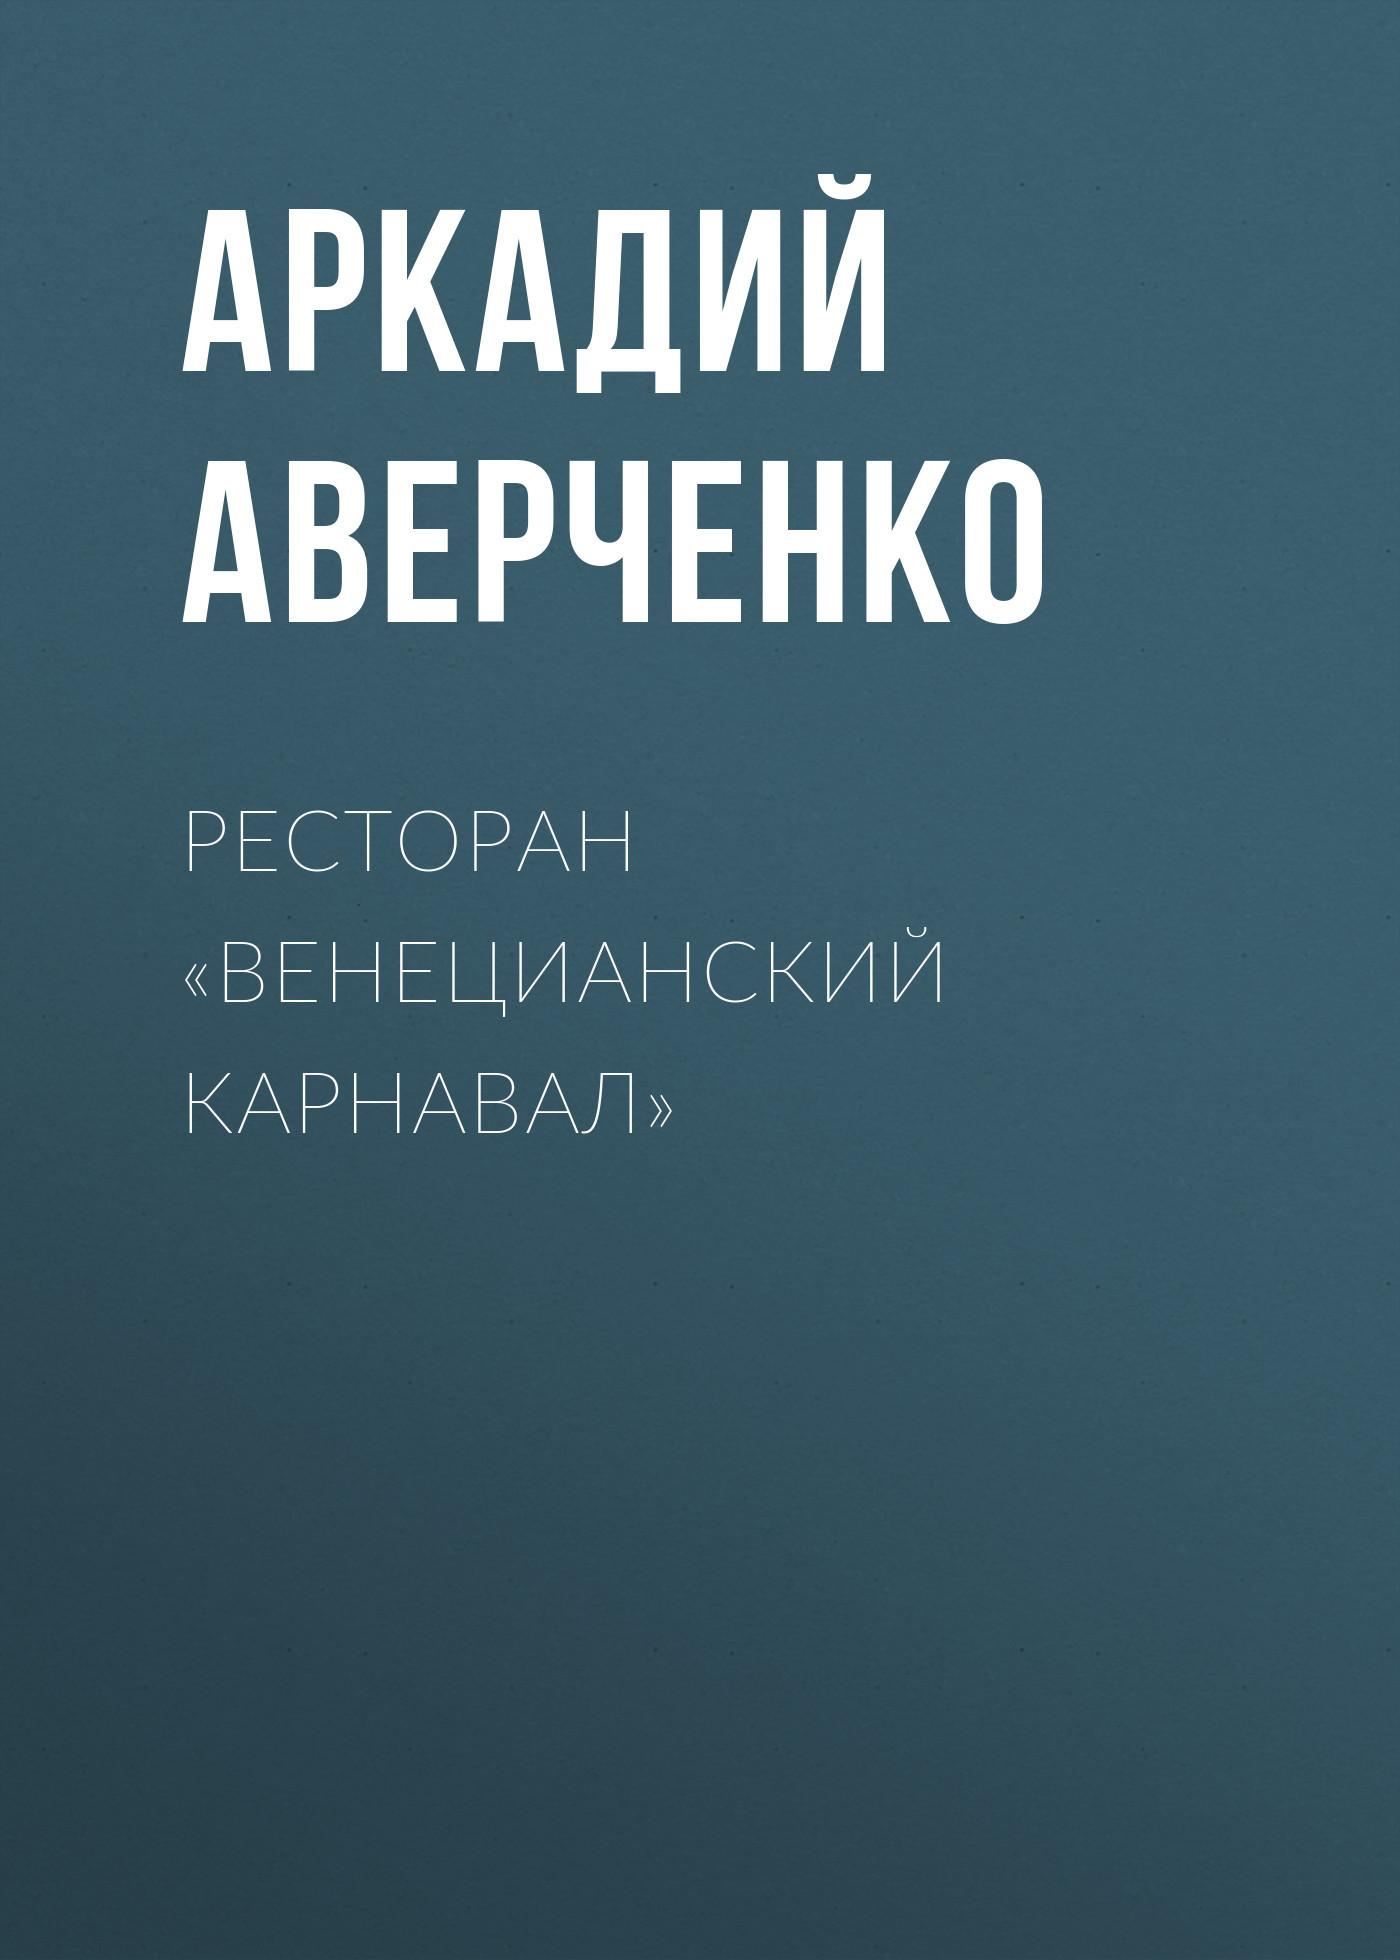 muzmo ru слушать онлайн